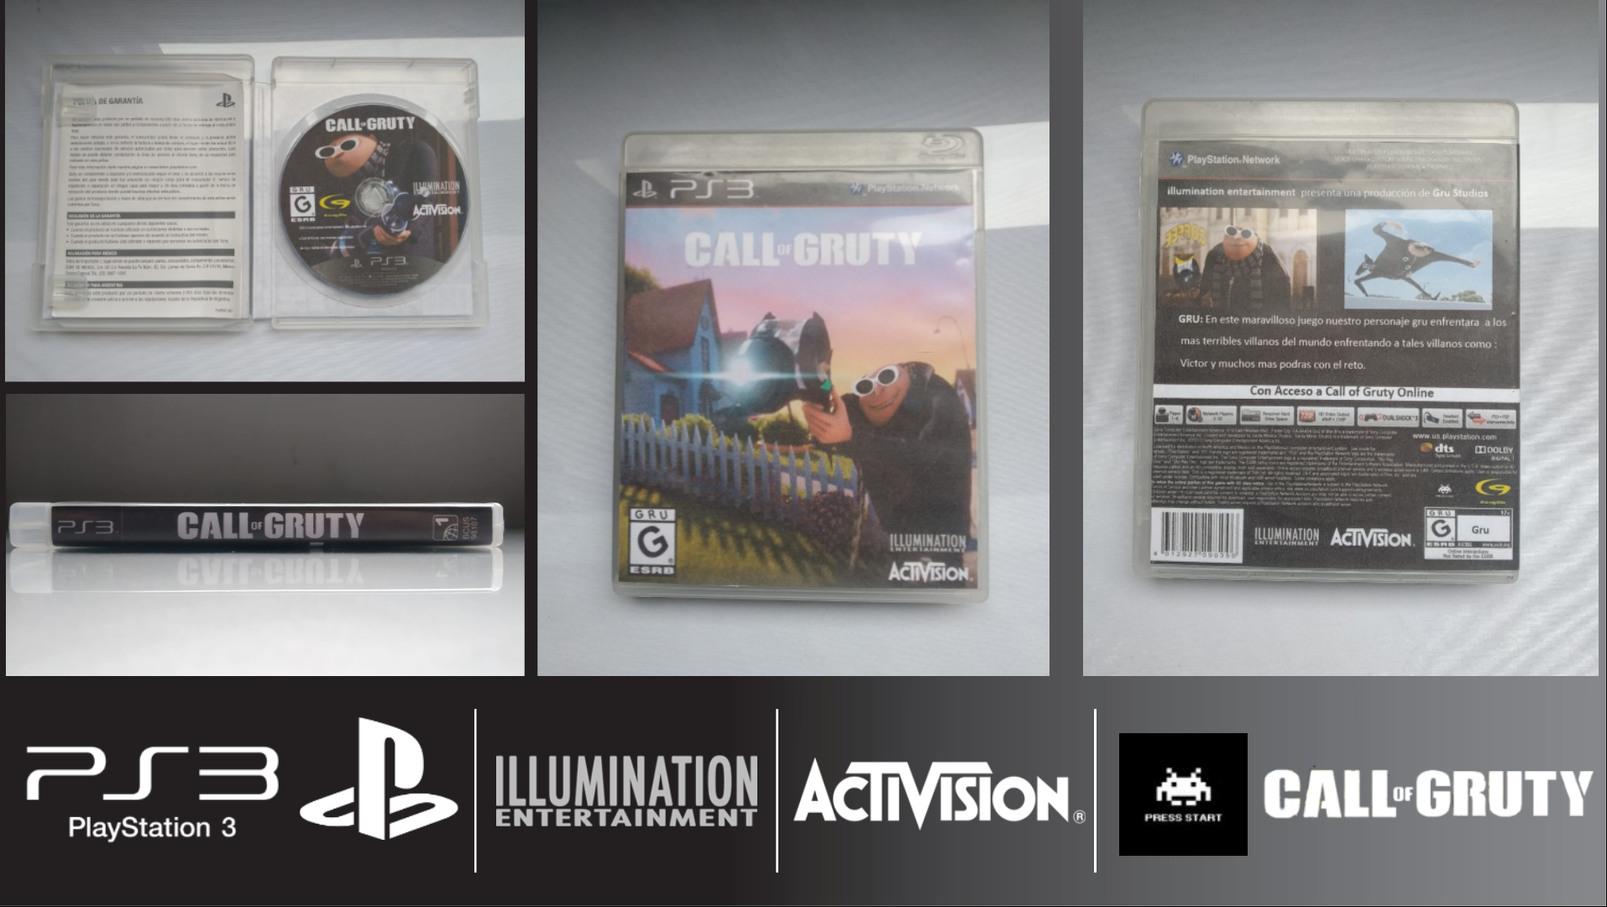 Call of Gruty PS3 Juego completo - meme